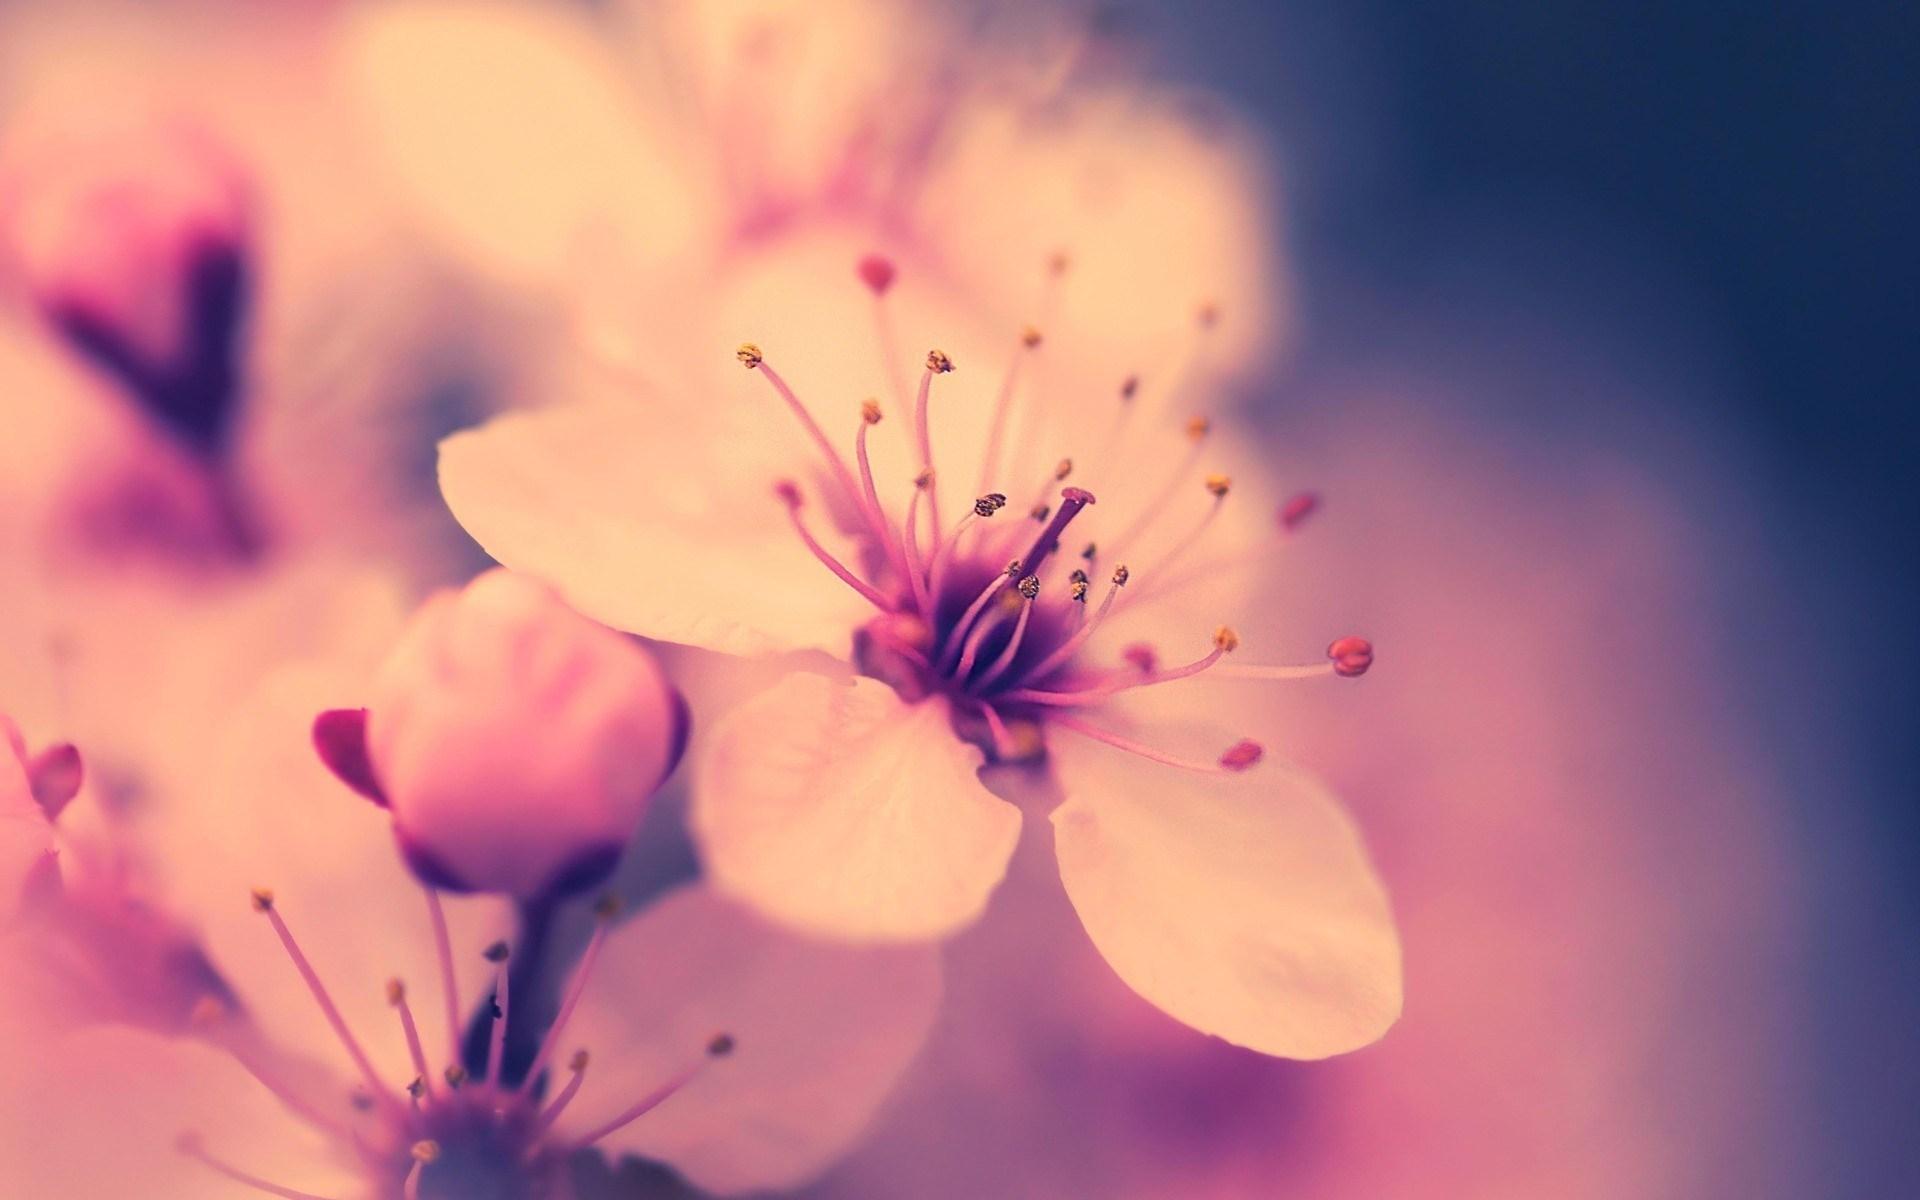 rst Spring flowers wallpaper Stock Photo © DenisVesely